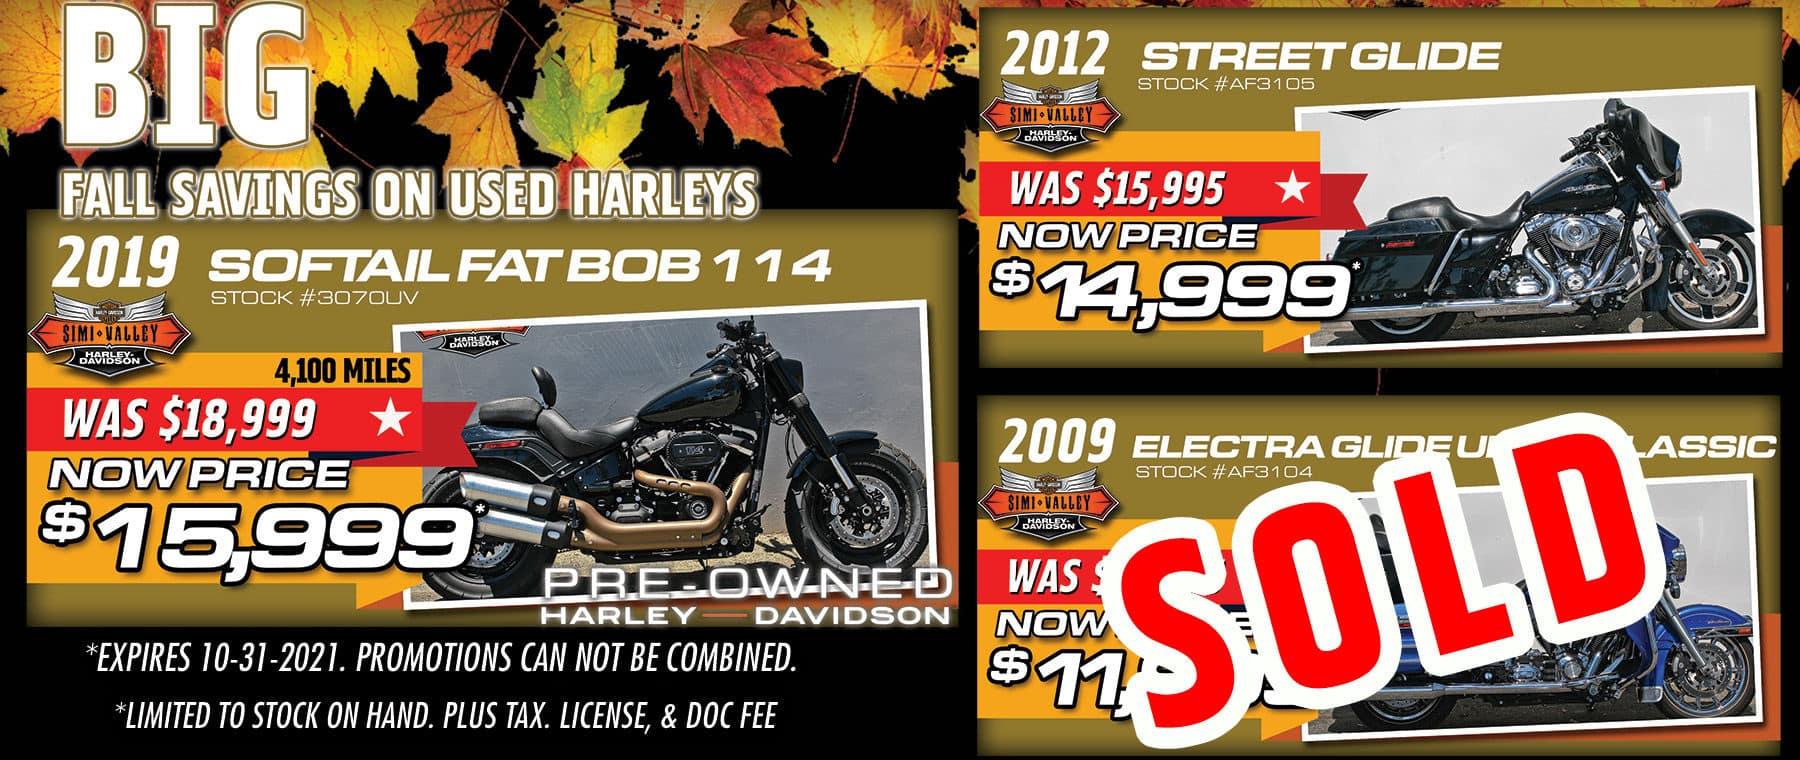 Fall-saving-on-used-harleys21